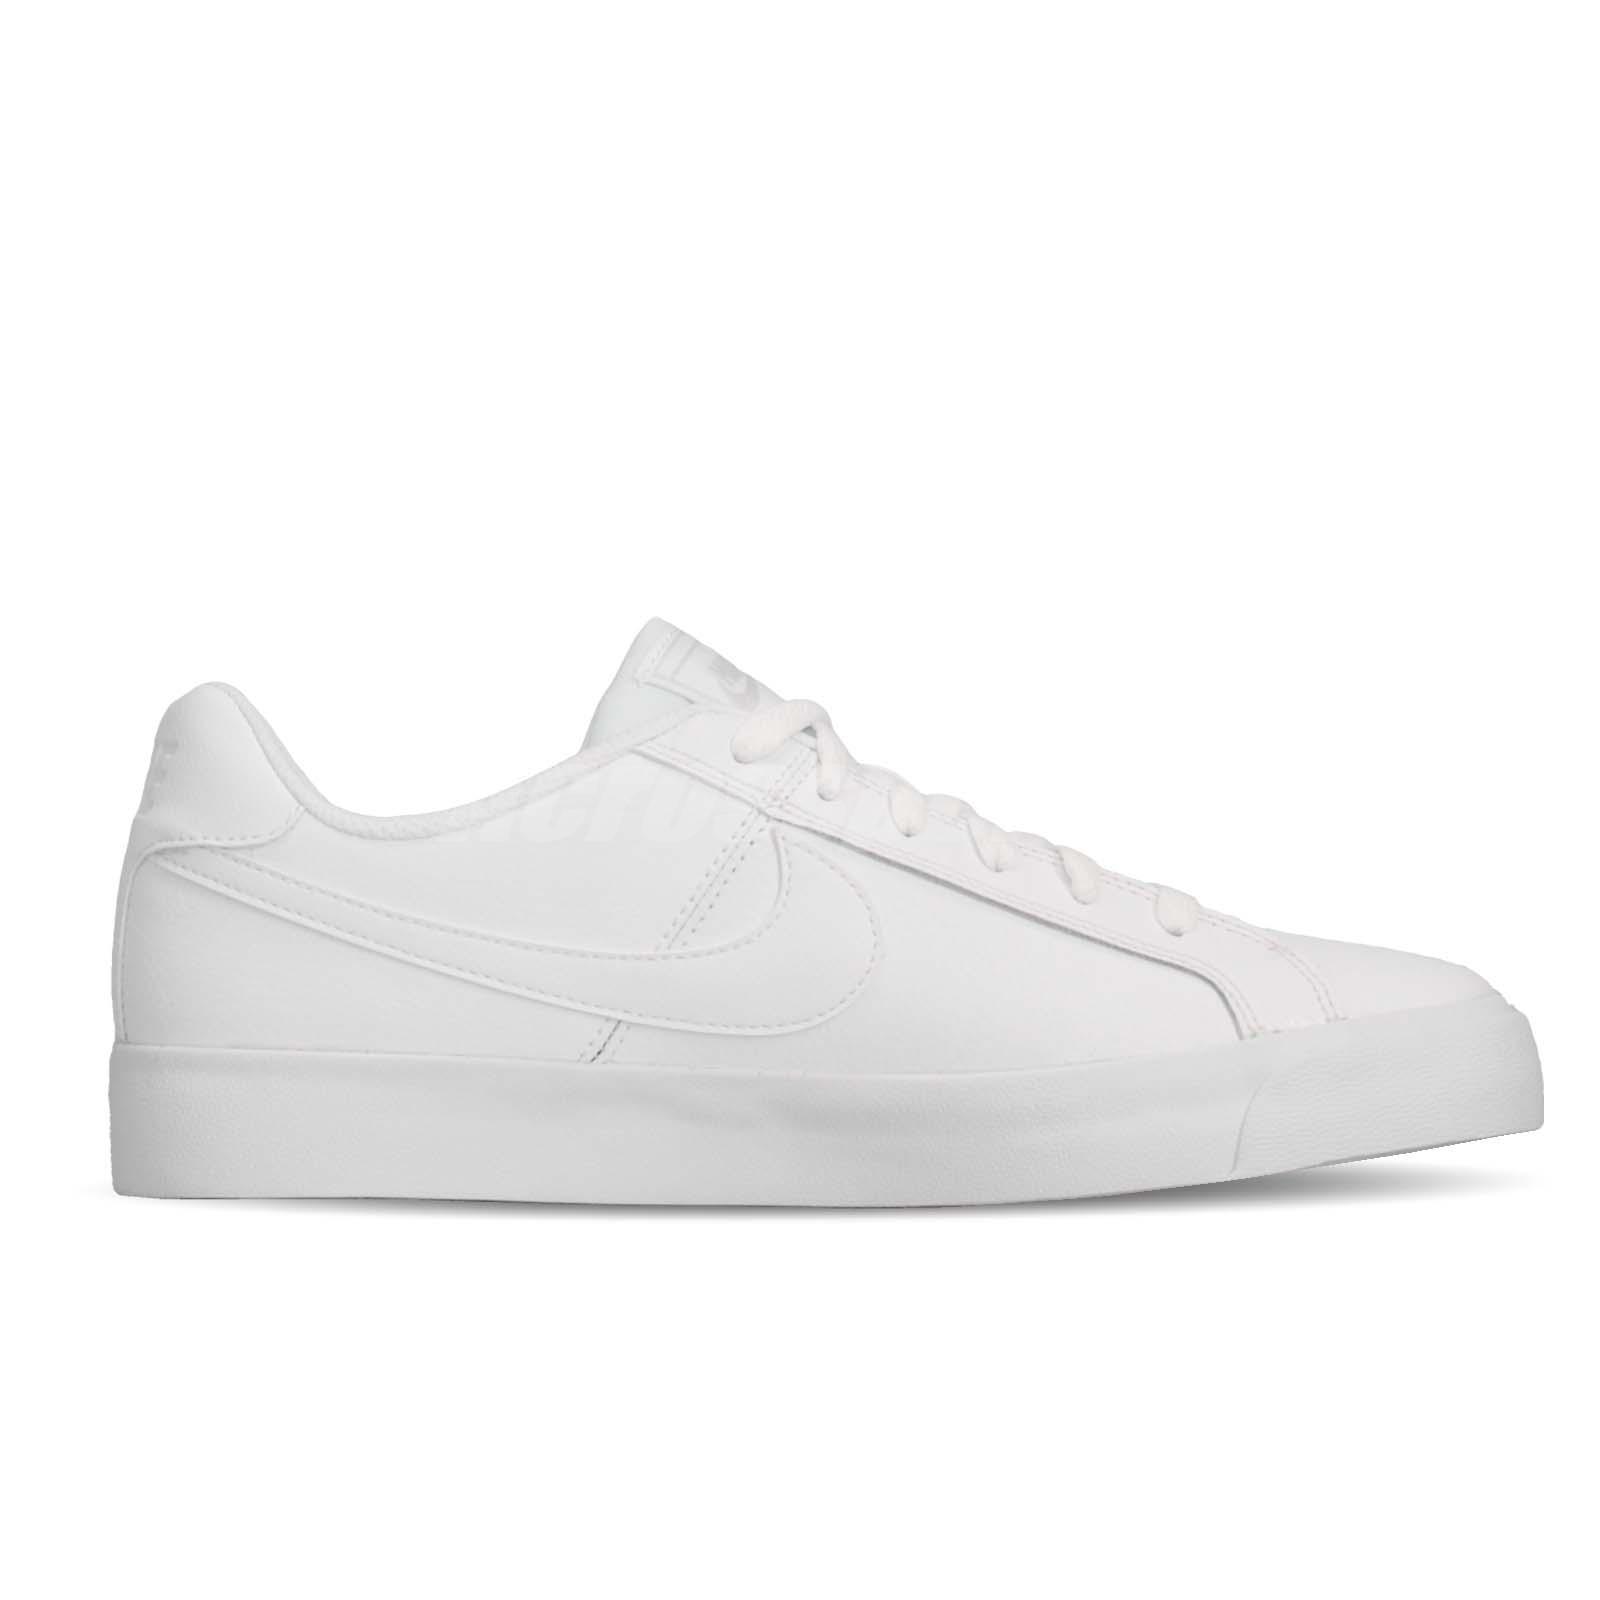 330868600 Nike Court Royale AC White Grey Gum Mens Casual Shoes Tennis ...